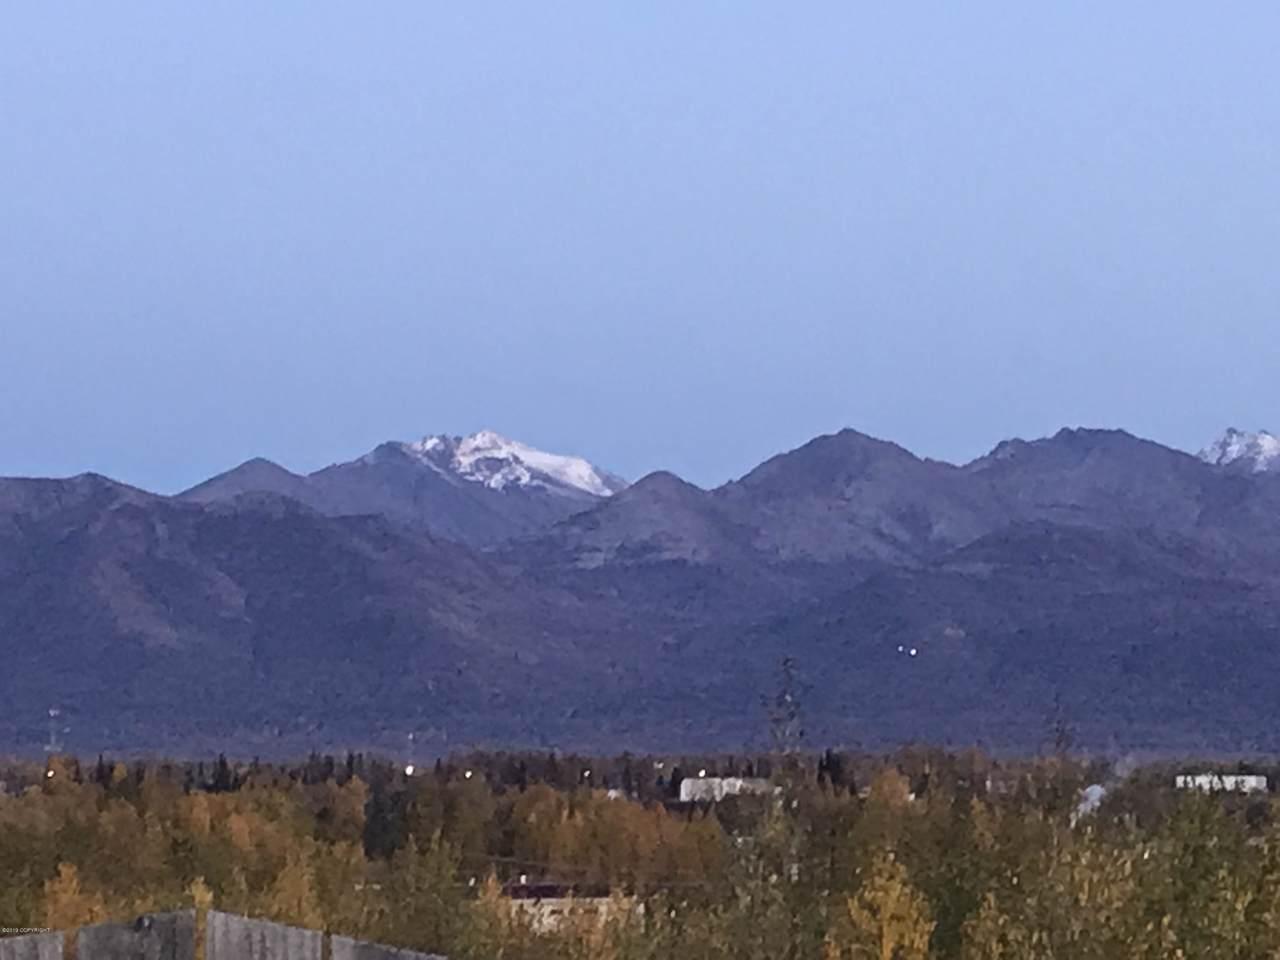 https://bt-photos.global.ssl.fastly.net/alaska/1280_boomver_1_19-16541-2.jpg